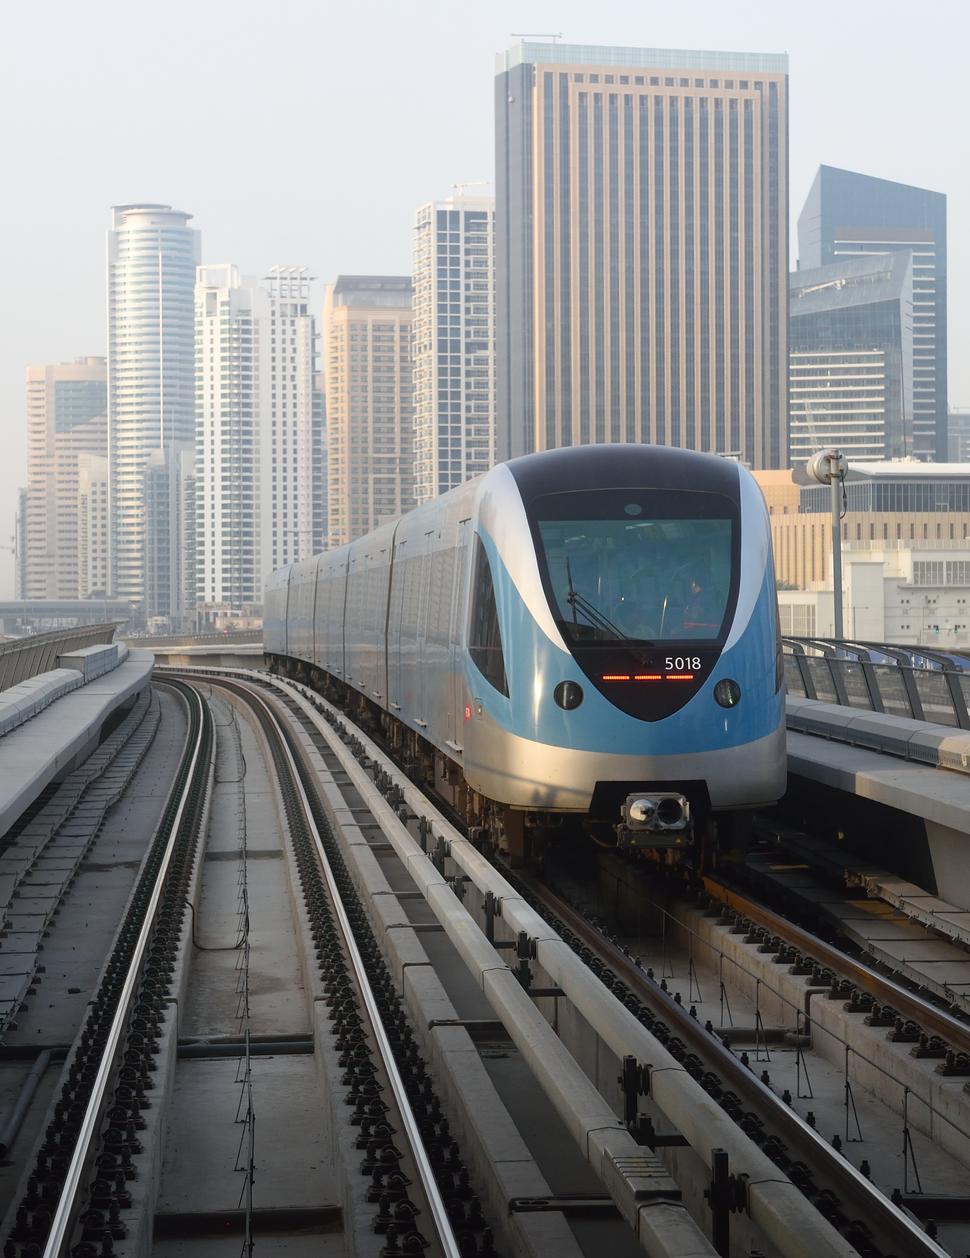 Dubai Metro photographed from Dubai Marina station in Dubai United Arab Emirages